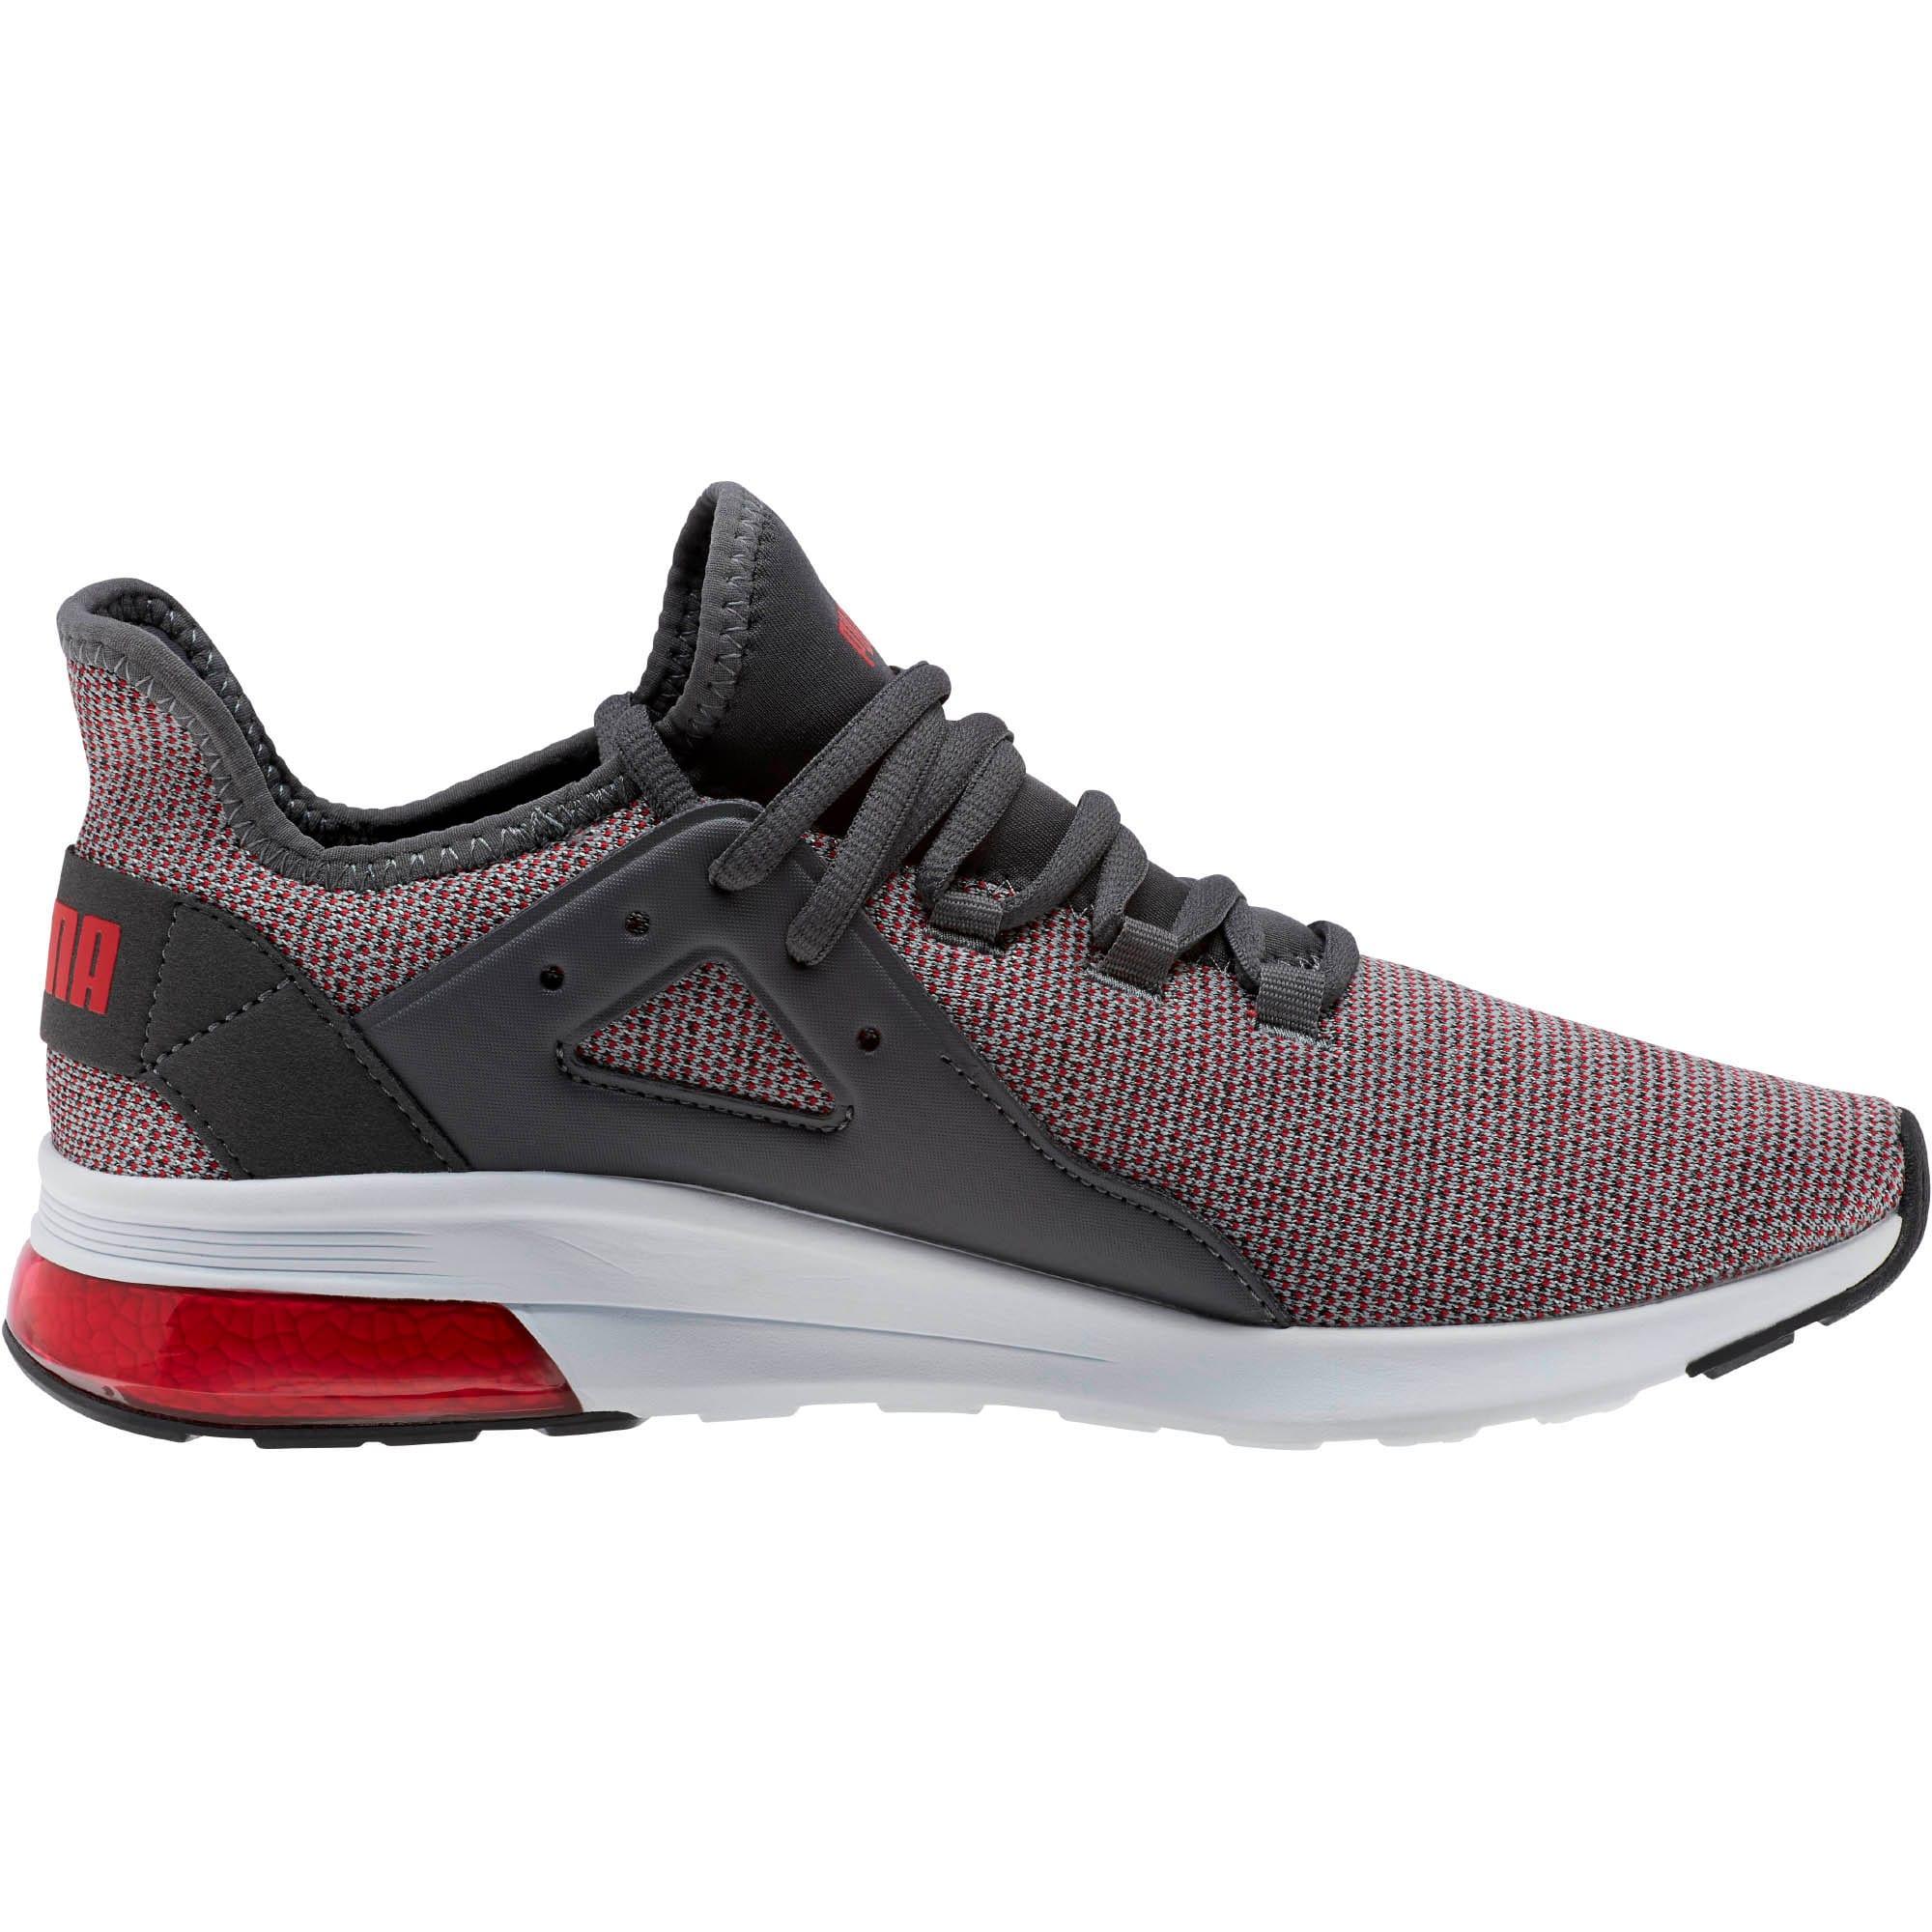 Thumbnail 3 of Electron Street Knit Sneakers, Iron Gate-Ribbon Red, medium